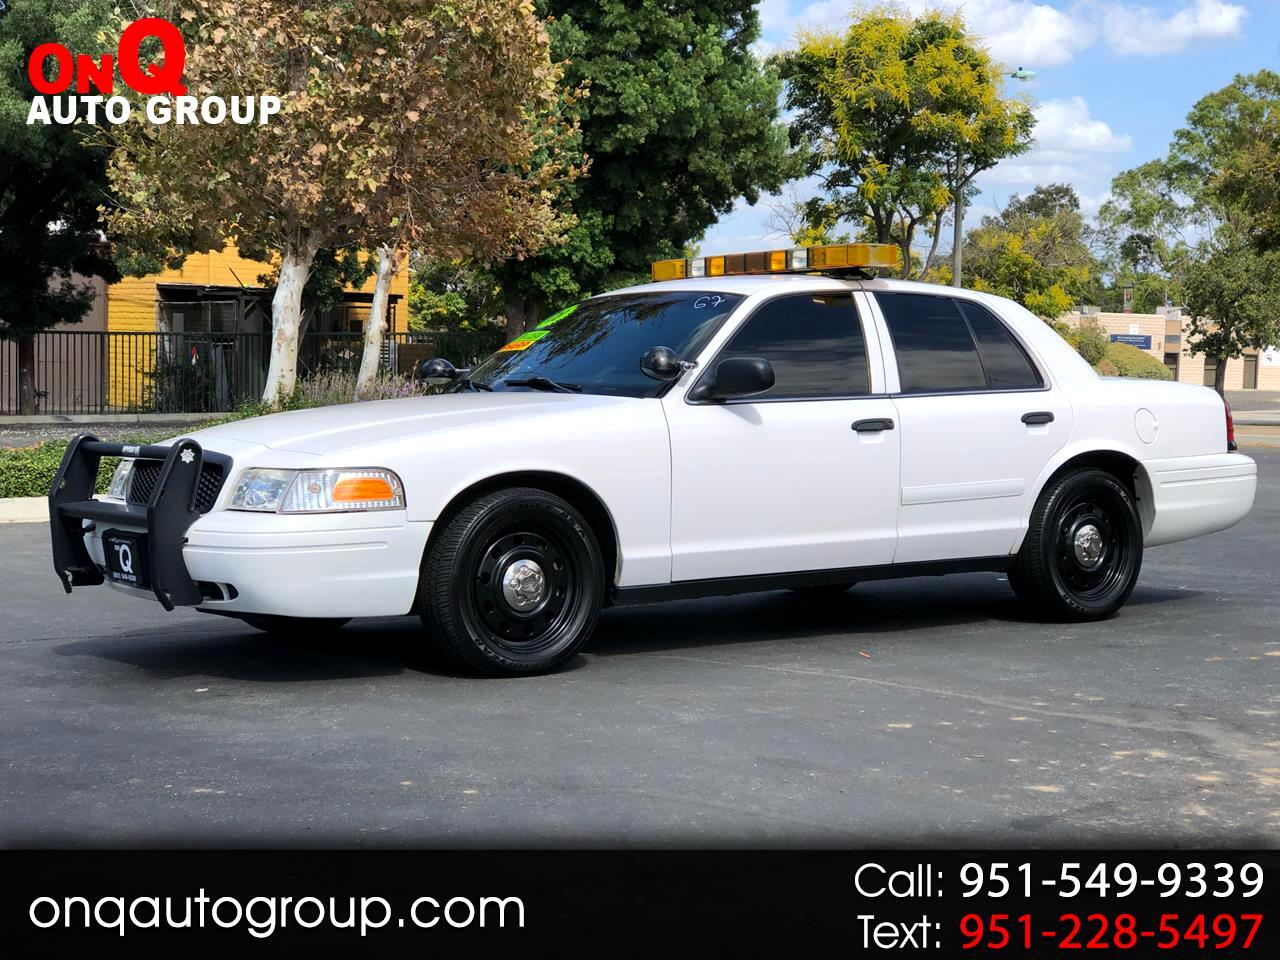 2008 Ford Police Interceptor 4dr Sdn w/3.27 Axle